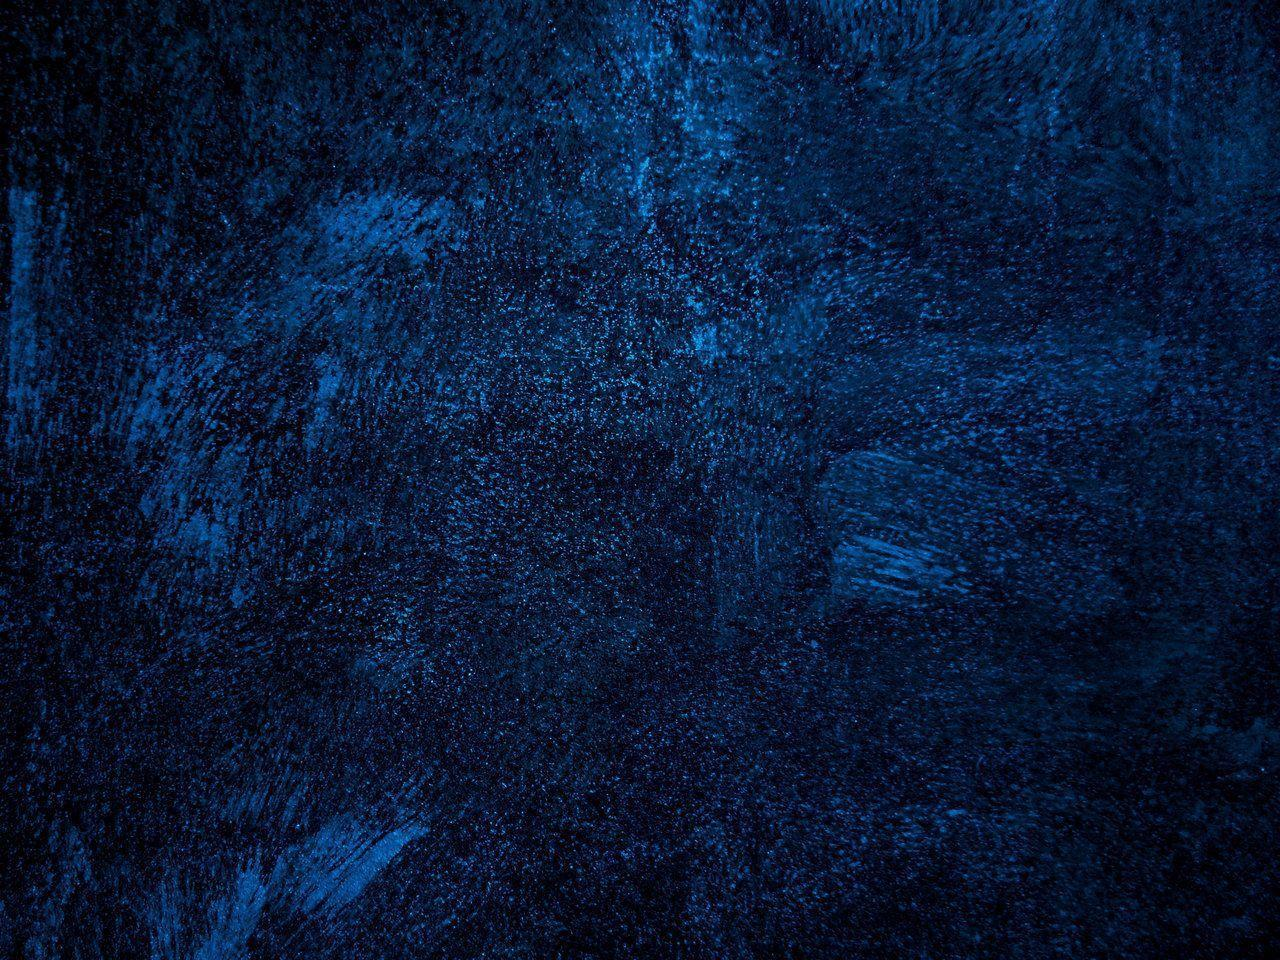 Navy Blue Backgrounds 1280x960